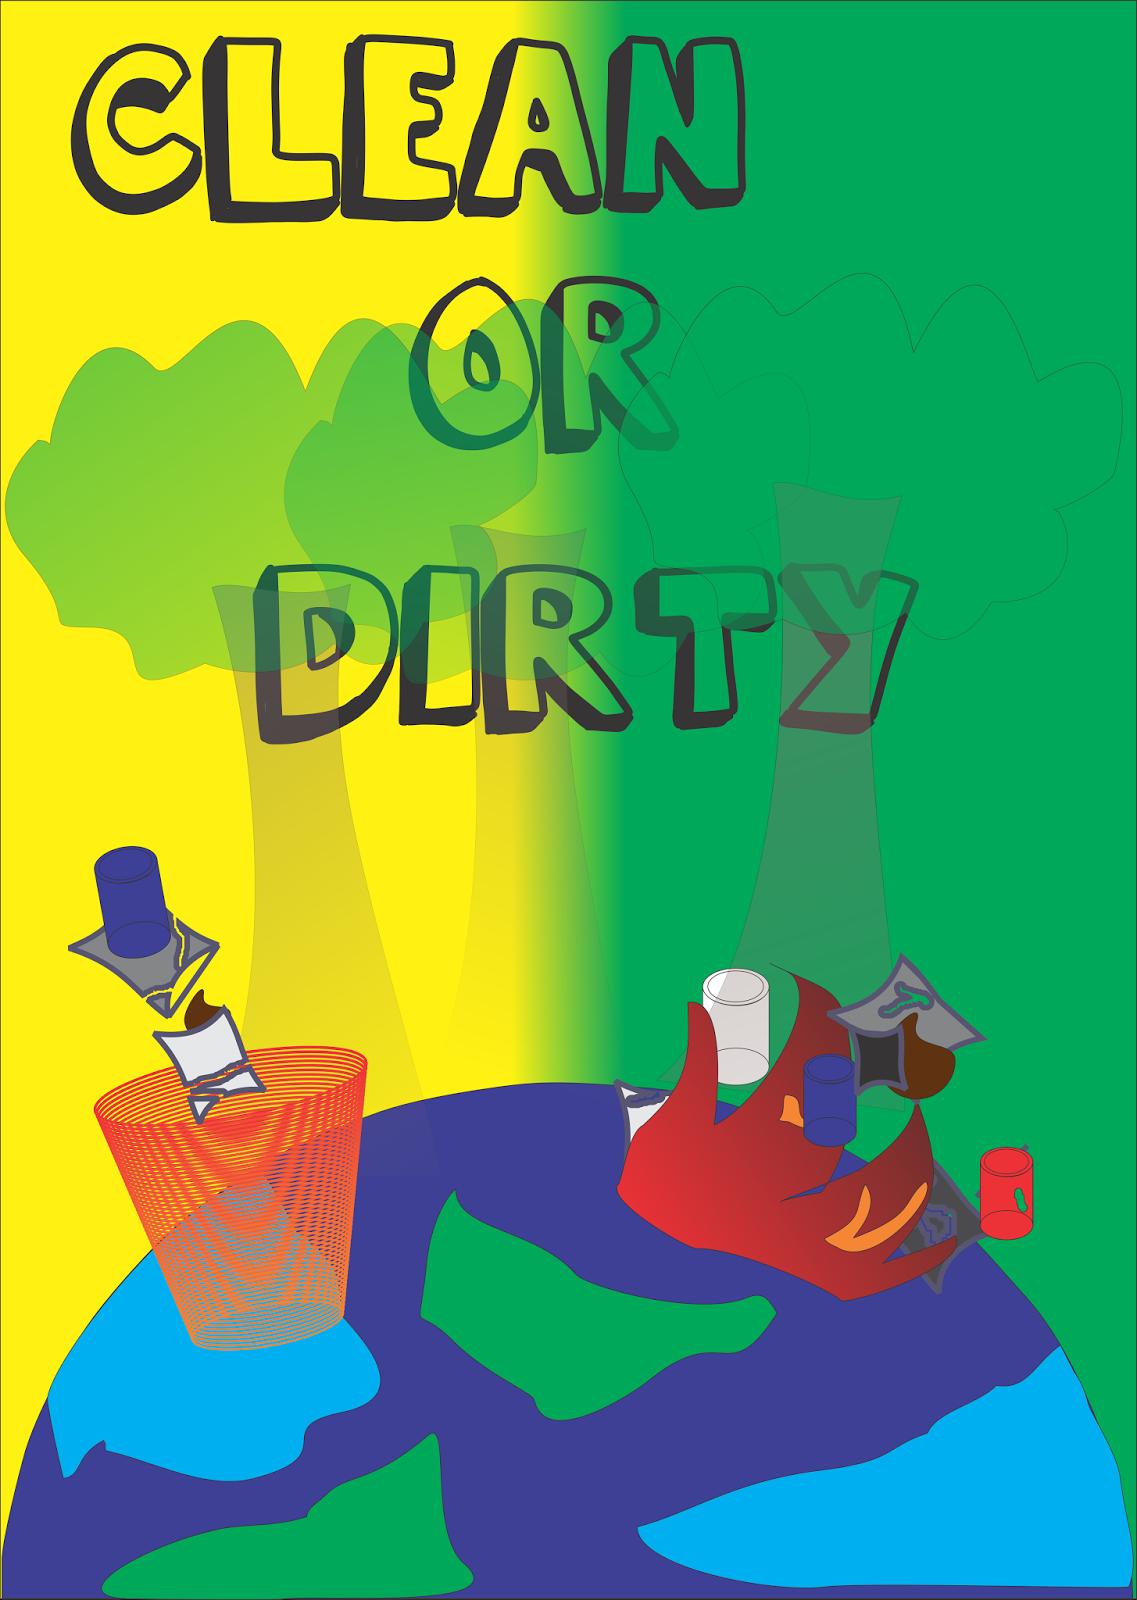 Download 101 Gambar Poster Tentang Lingkungan Hidup Paling